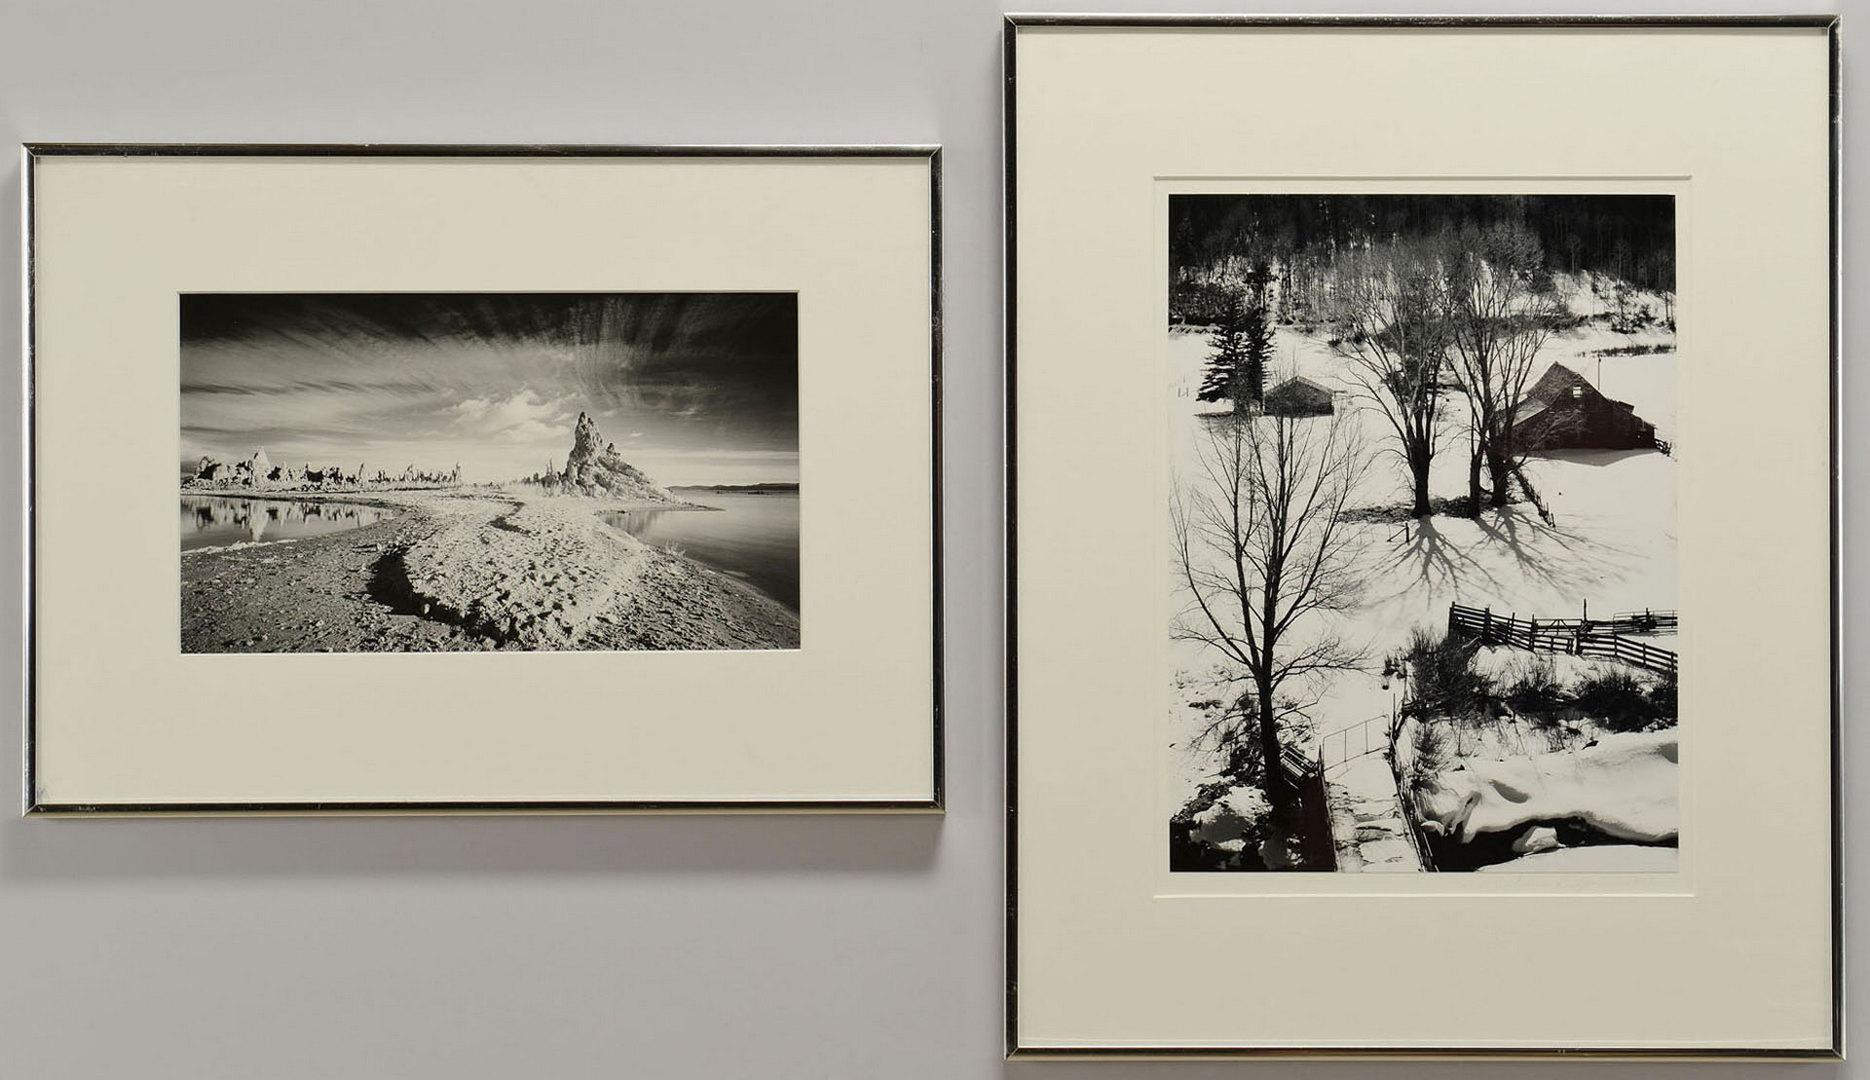 Lot 368: Two framed Silver Gelatin Prints, Dawson & Benjami